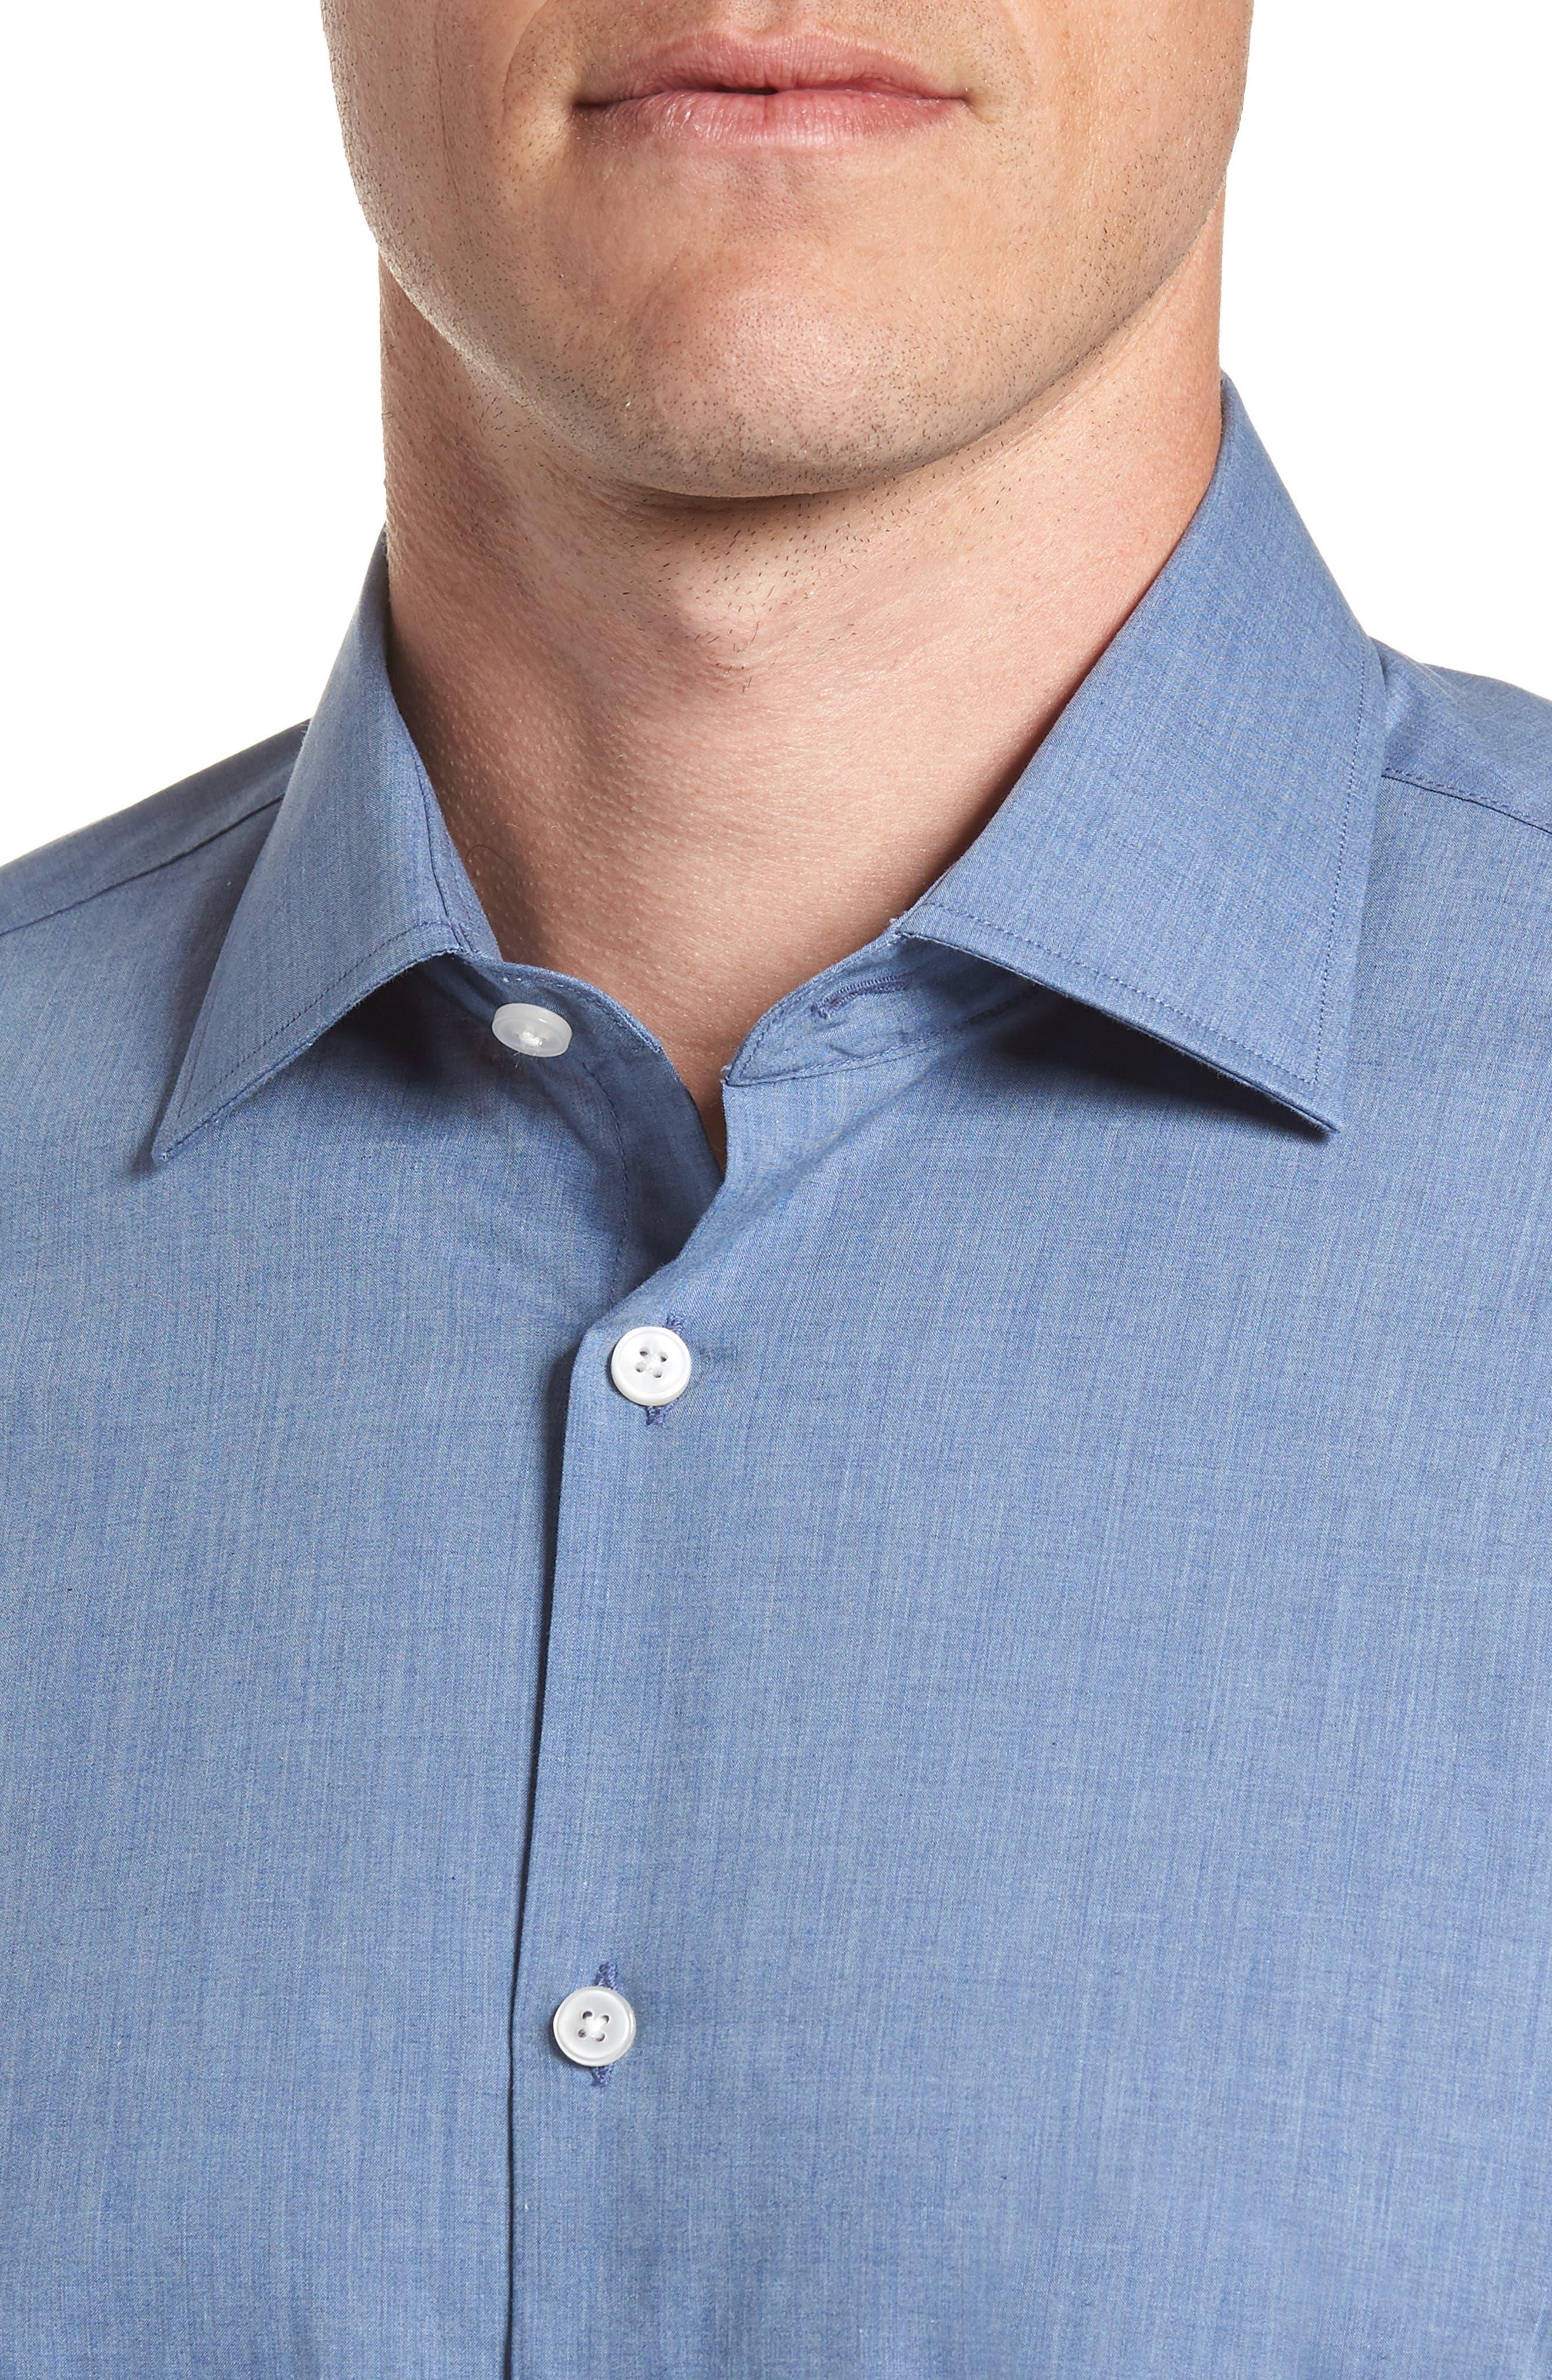 Regular Fit Solid Dress Shirt,                             Alternate thumbnail 2, color,                             BLUE HEATHER